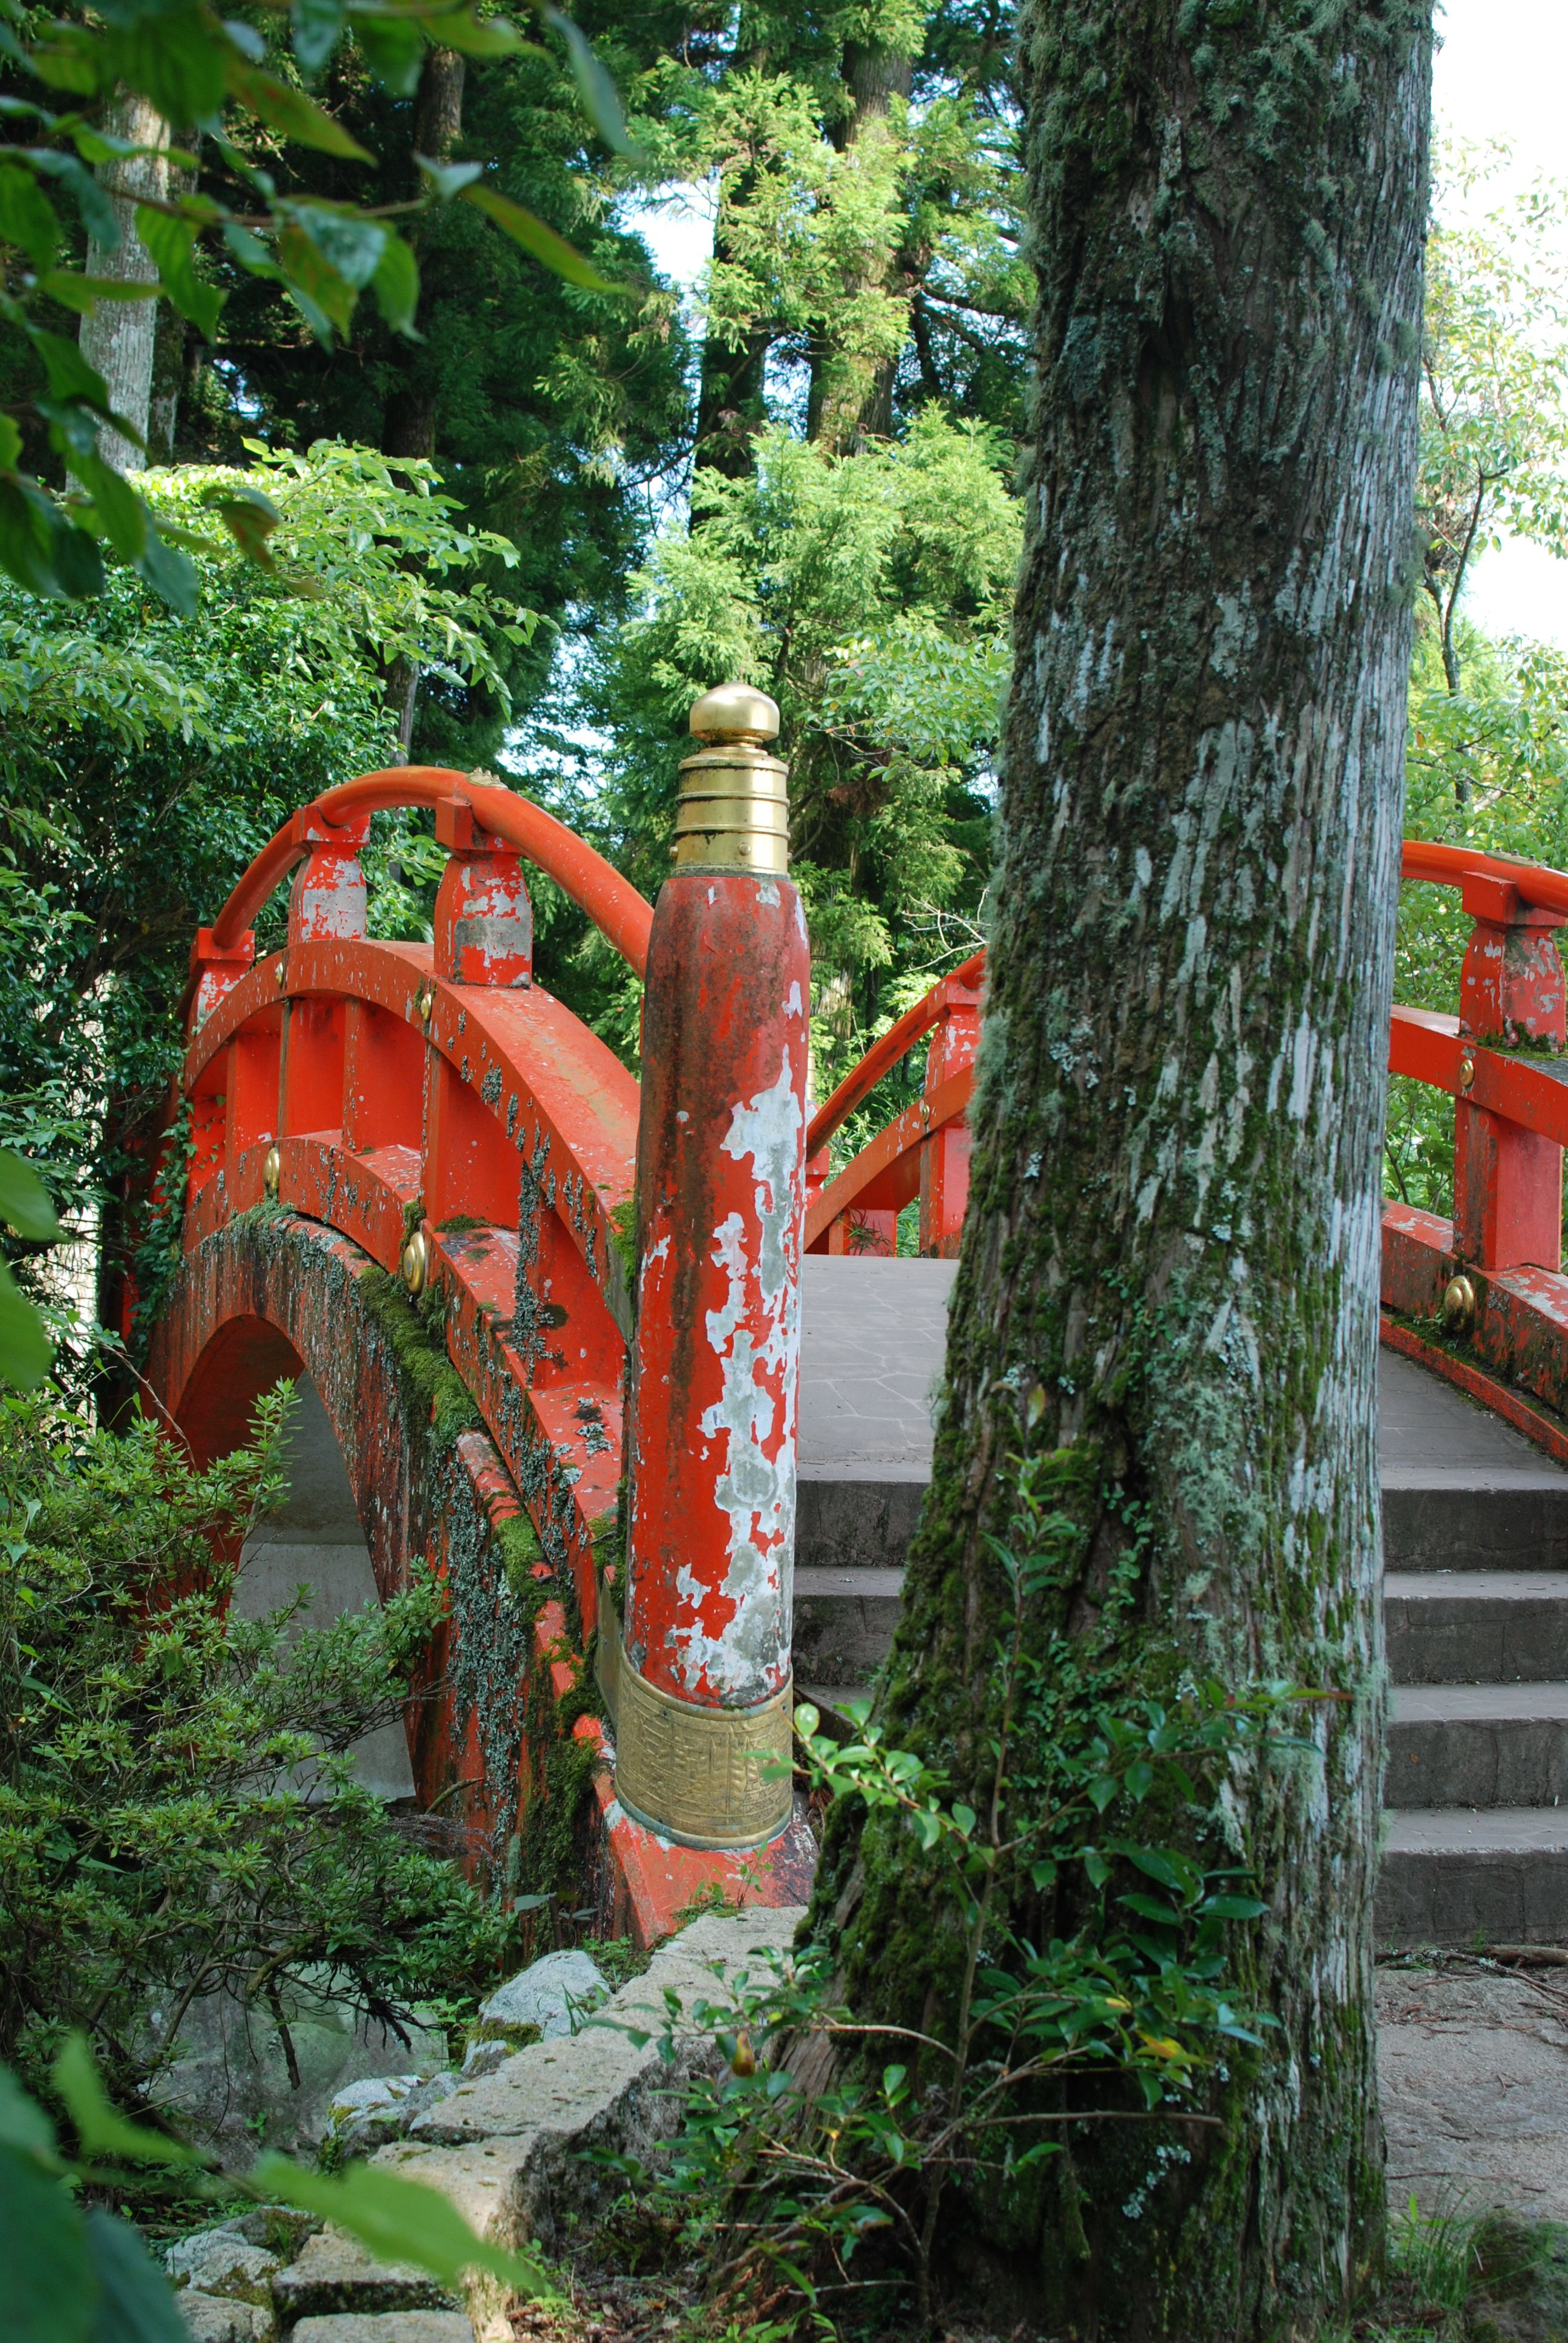 Bridge next to the Torii Gate at the Lake Ashinoko, Hakone